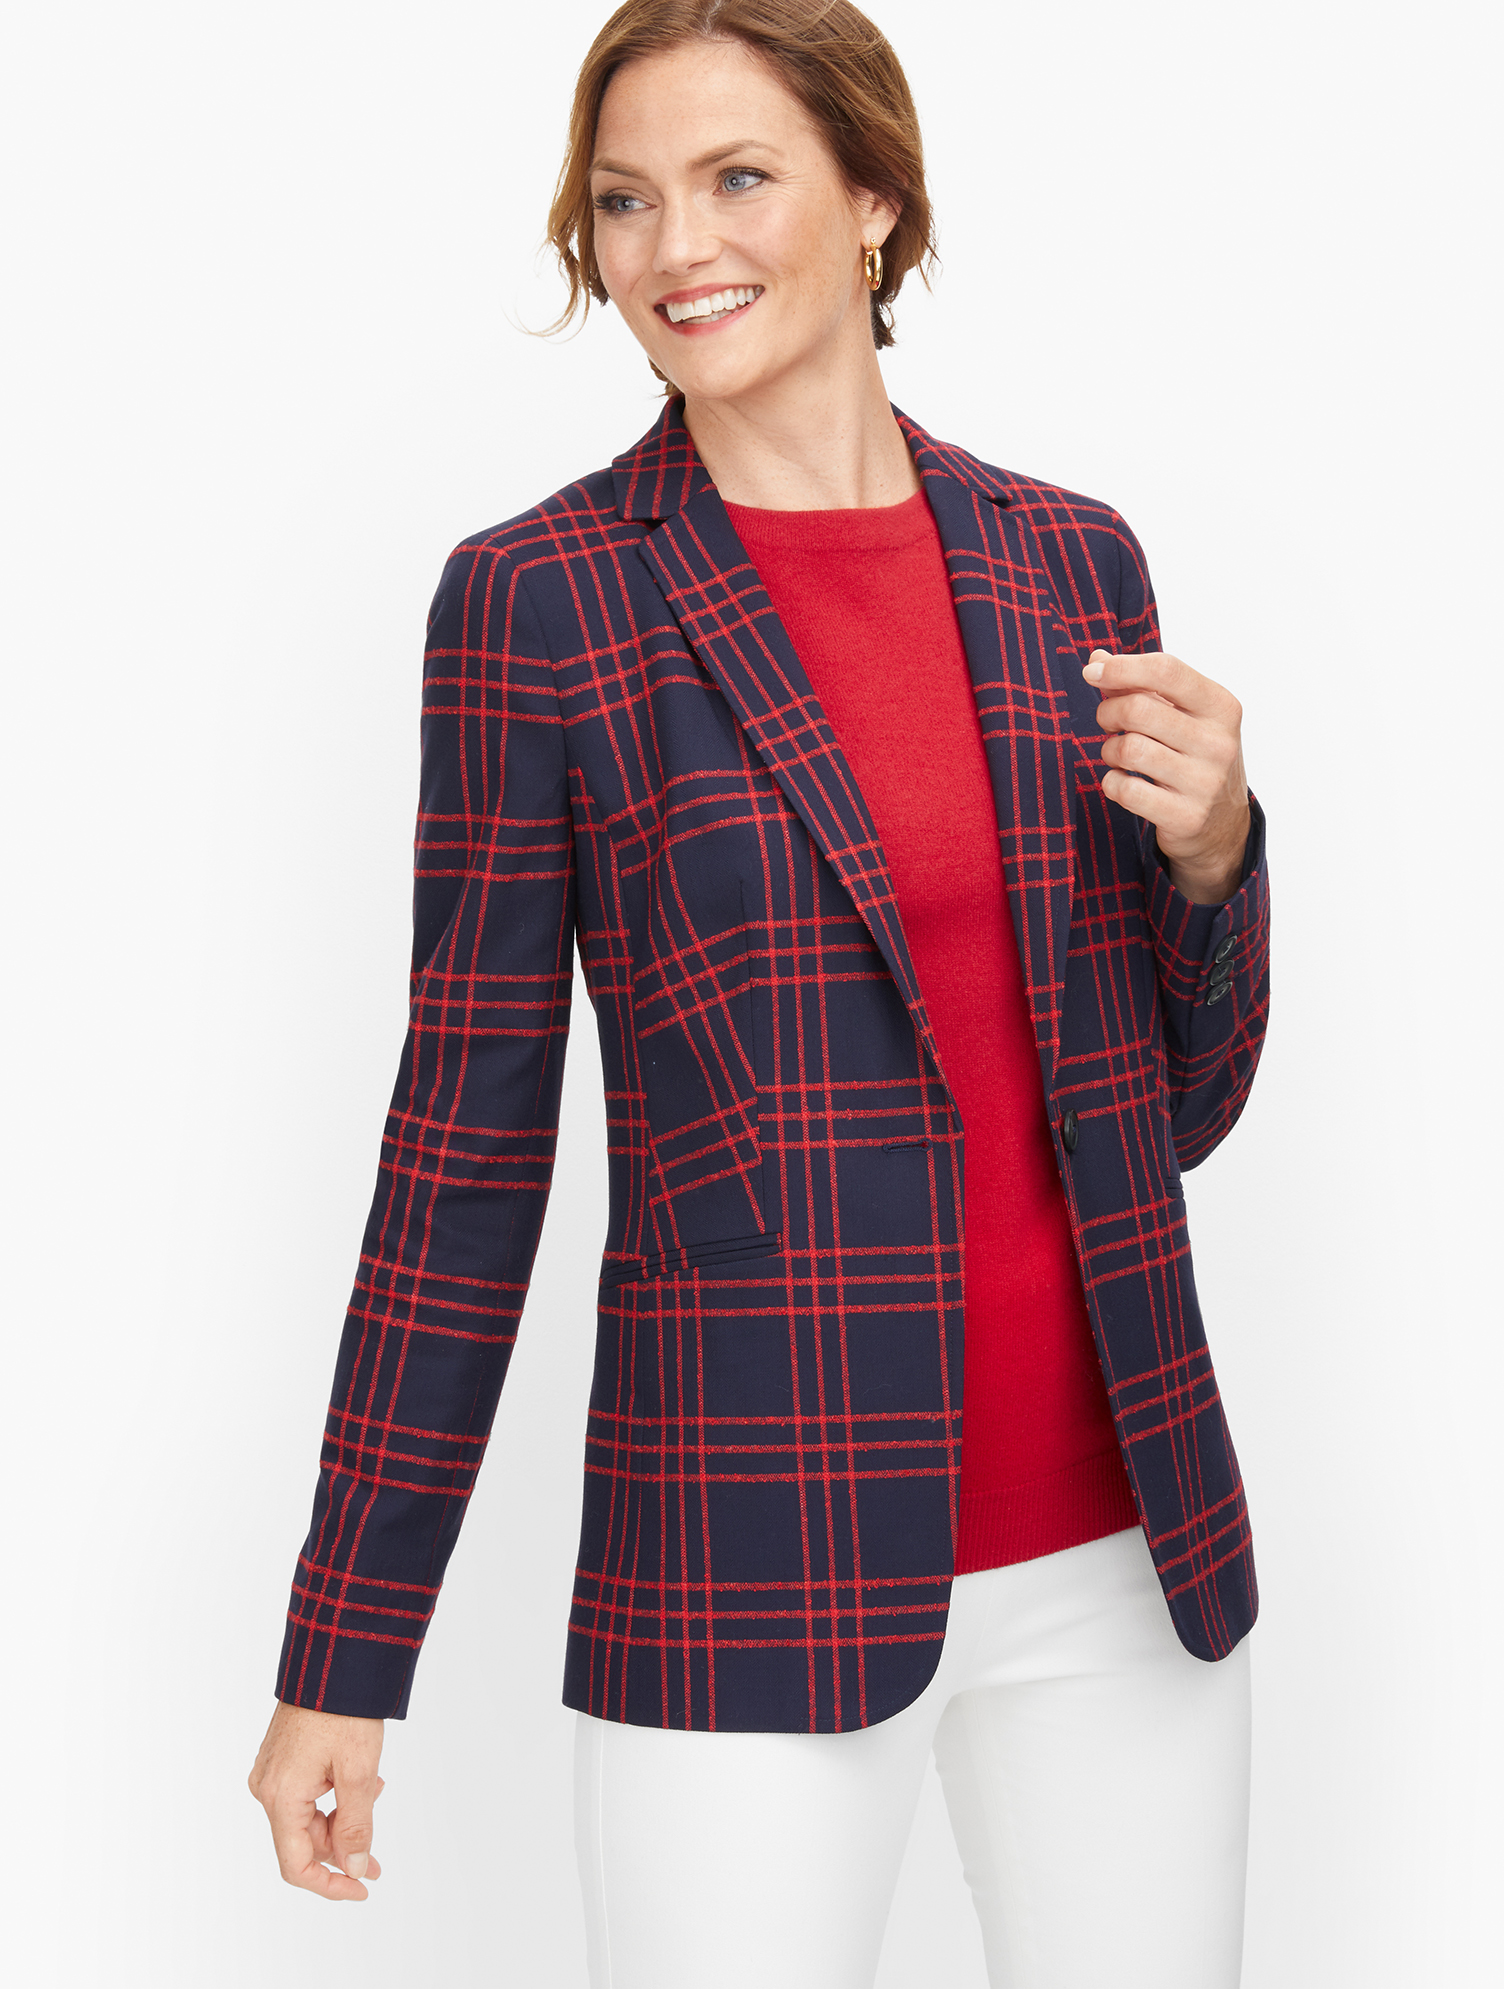 Vintage Coats & Jackets | Retro Coats and Jackets Bouclé Windowpane Blazer - Red - 16 Talbots $169.00 AT vintagedancer.com